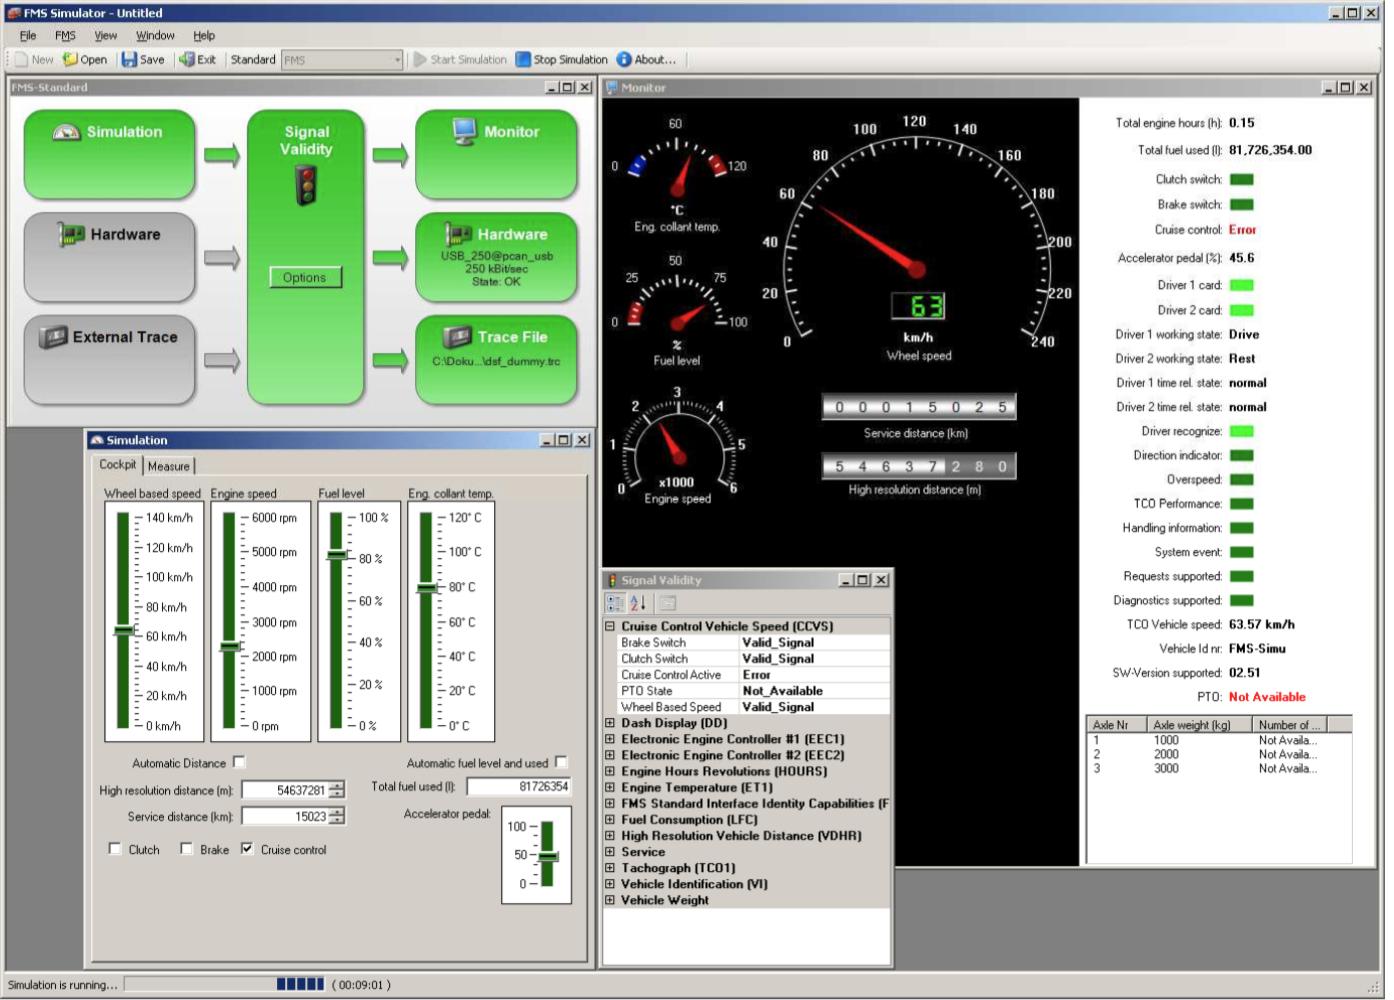 CANgine FMS-Sim-SW 2 Telematik von ESS Embedded Systems Solutions GmbH